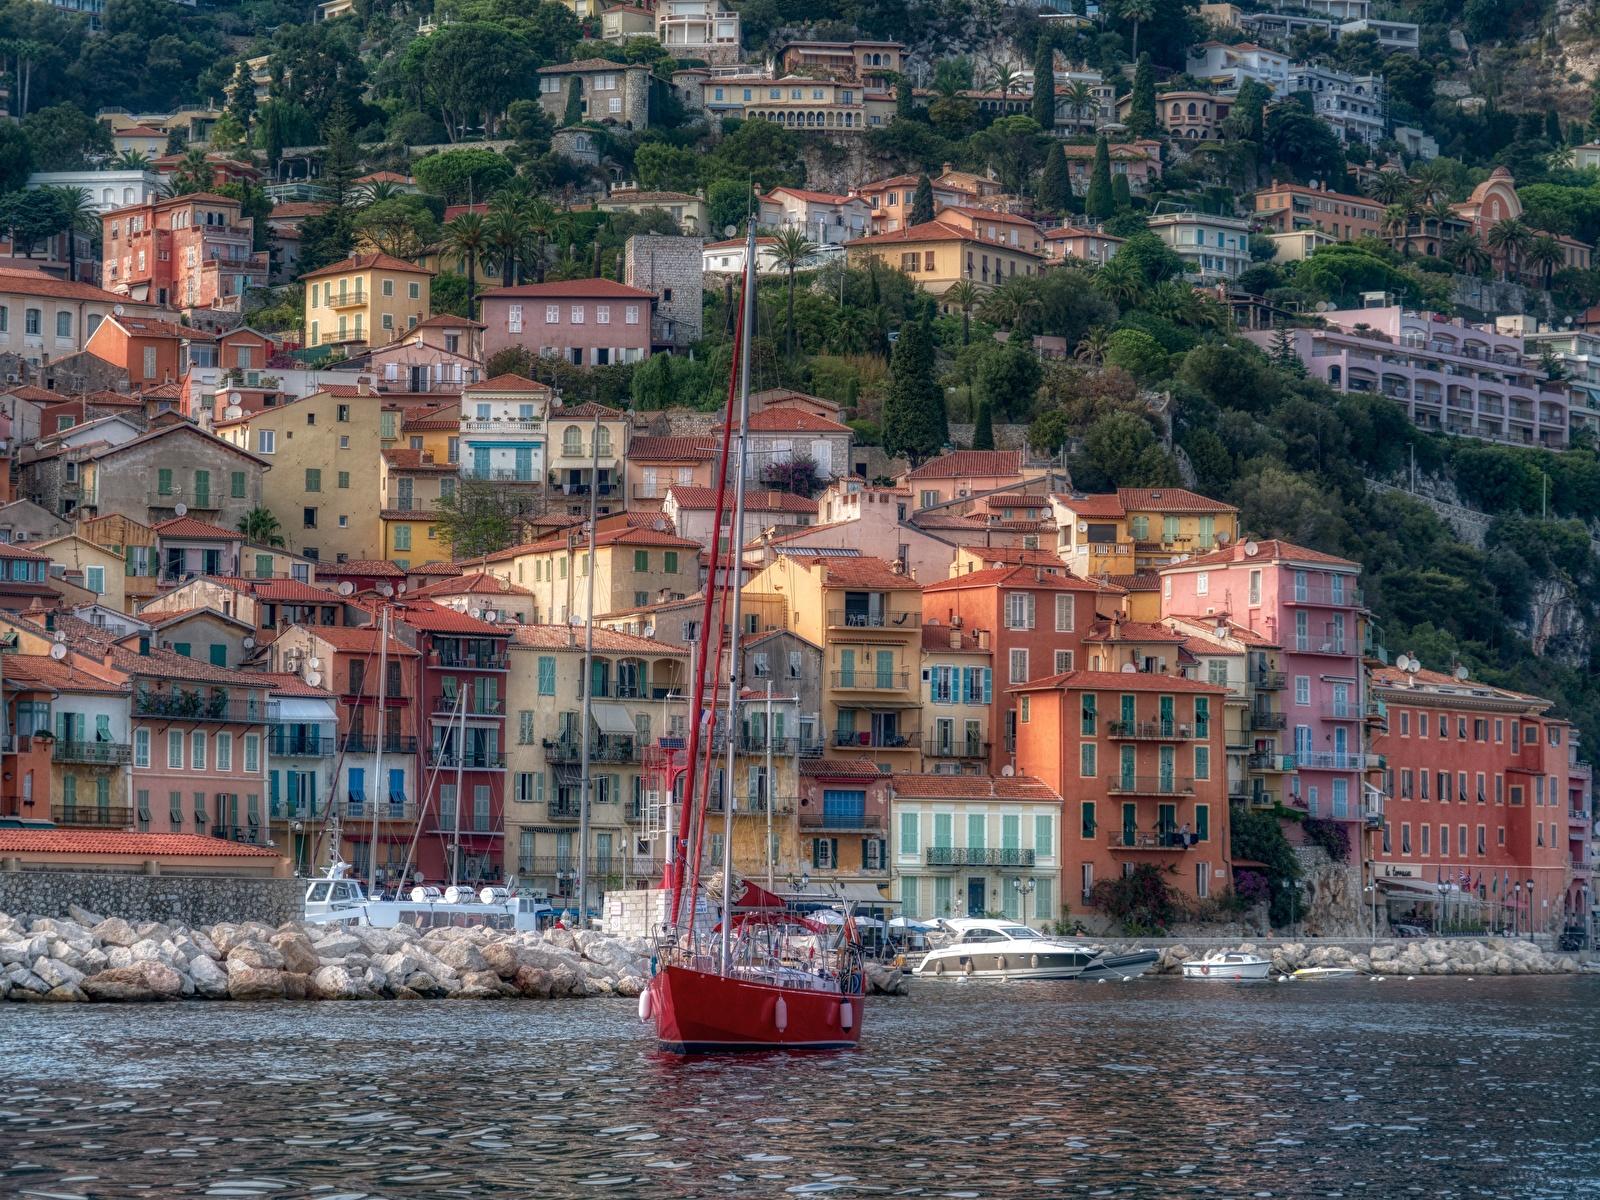 Картинка Франция French Riviera Villefranche-sur-Mer HDRI Яхта Побережье Дома город 1600x1200 HDR берег Города Здания